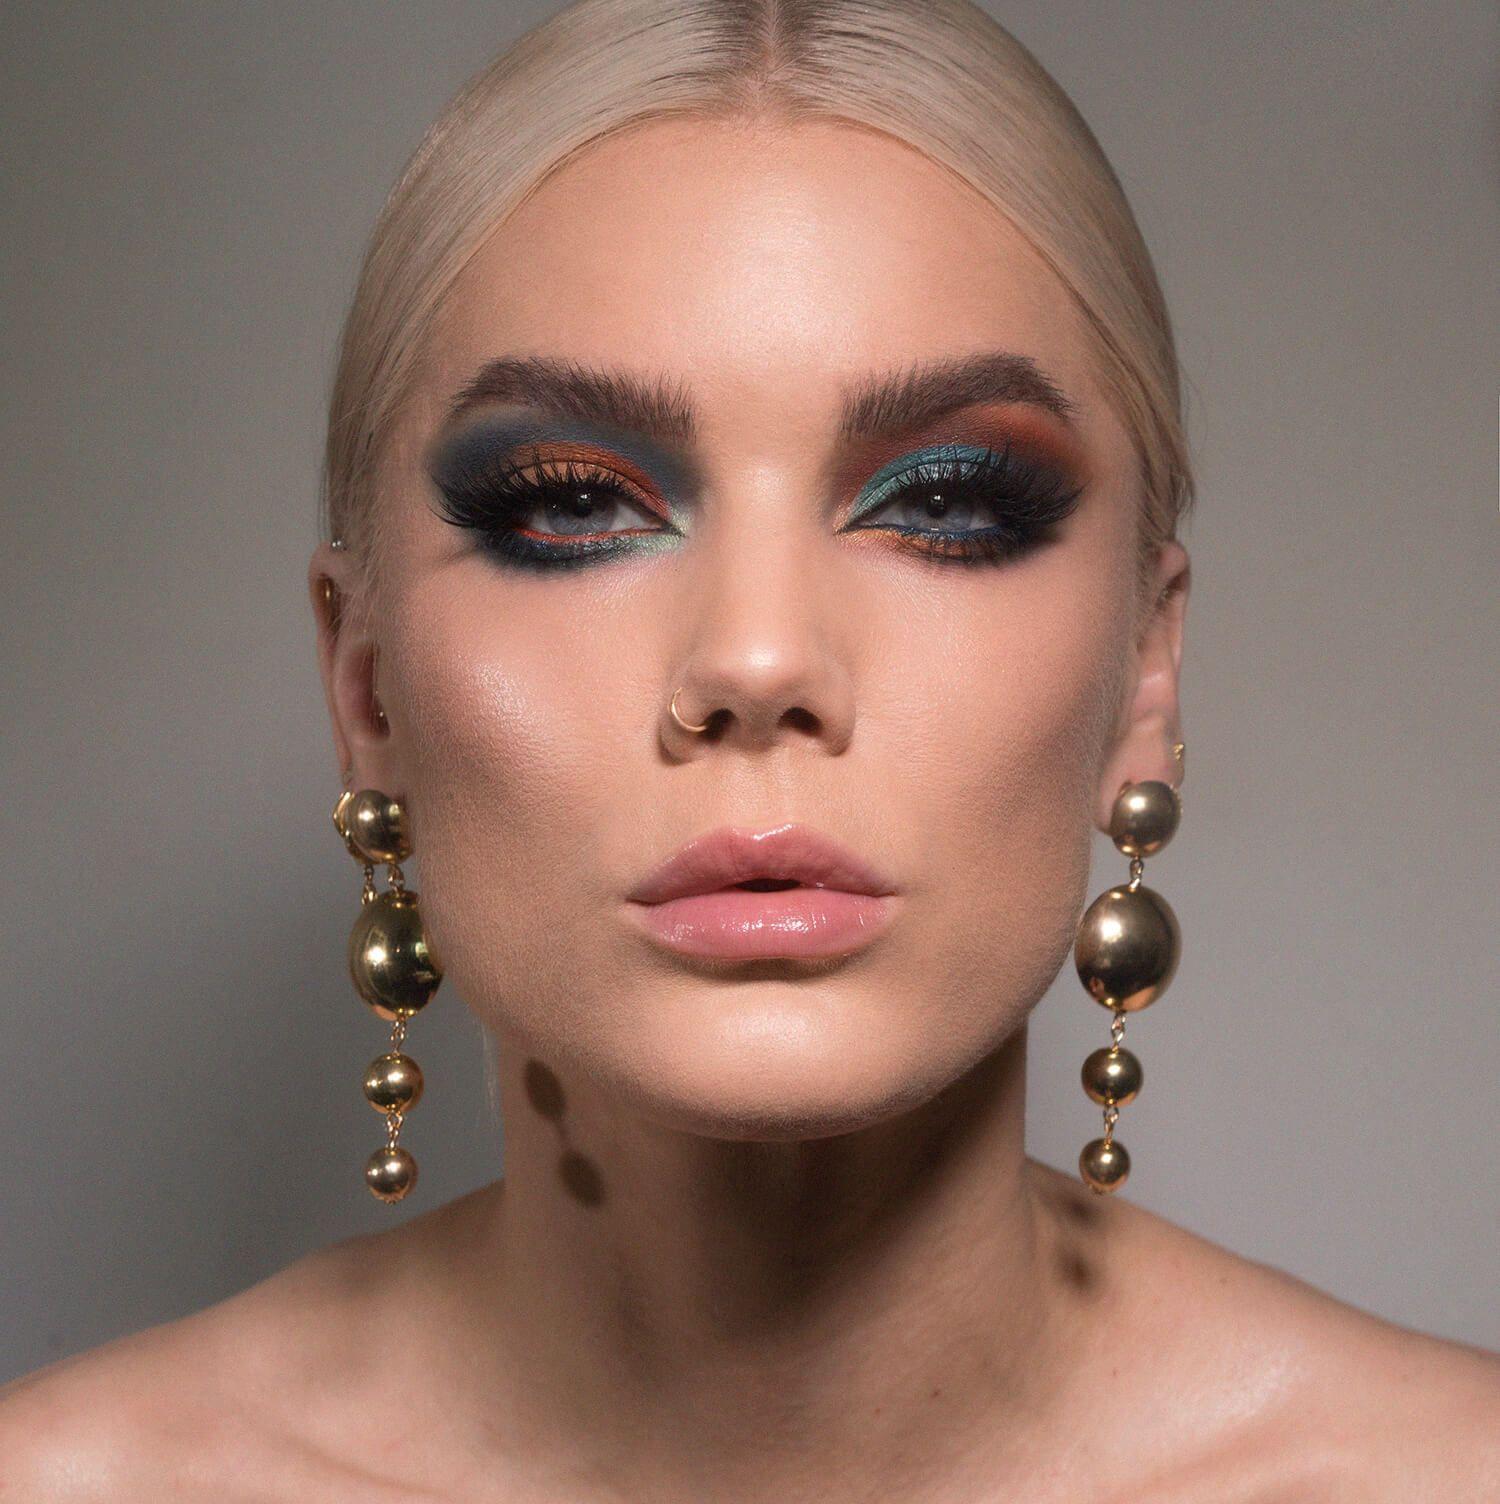 TODAYS LOOK | AMARYLLIS | Maquillaje bonito, Maquillaje